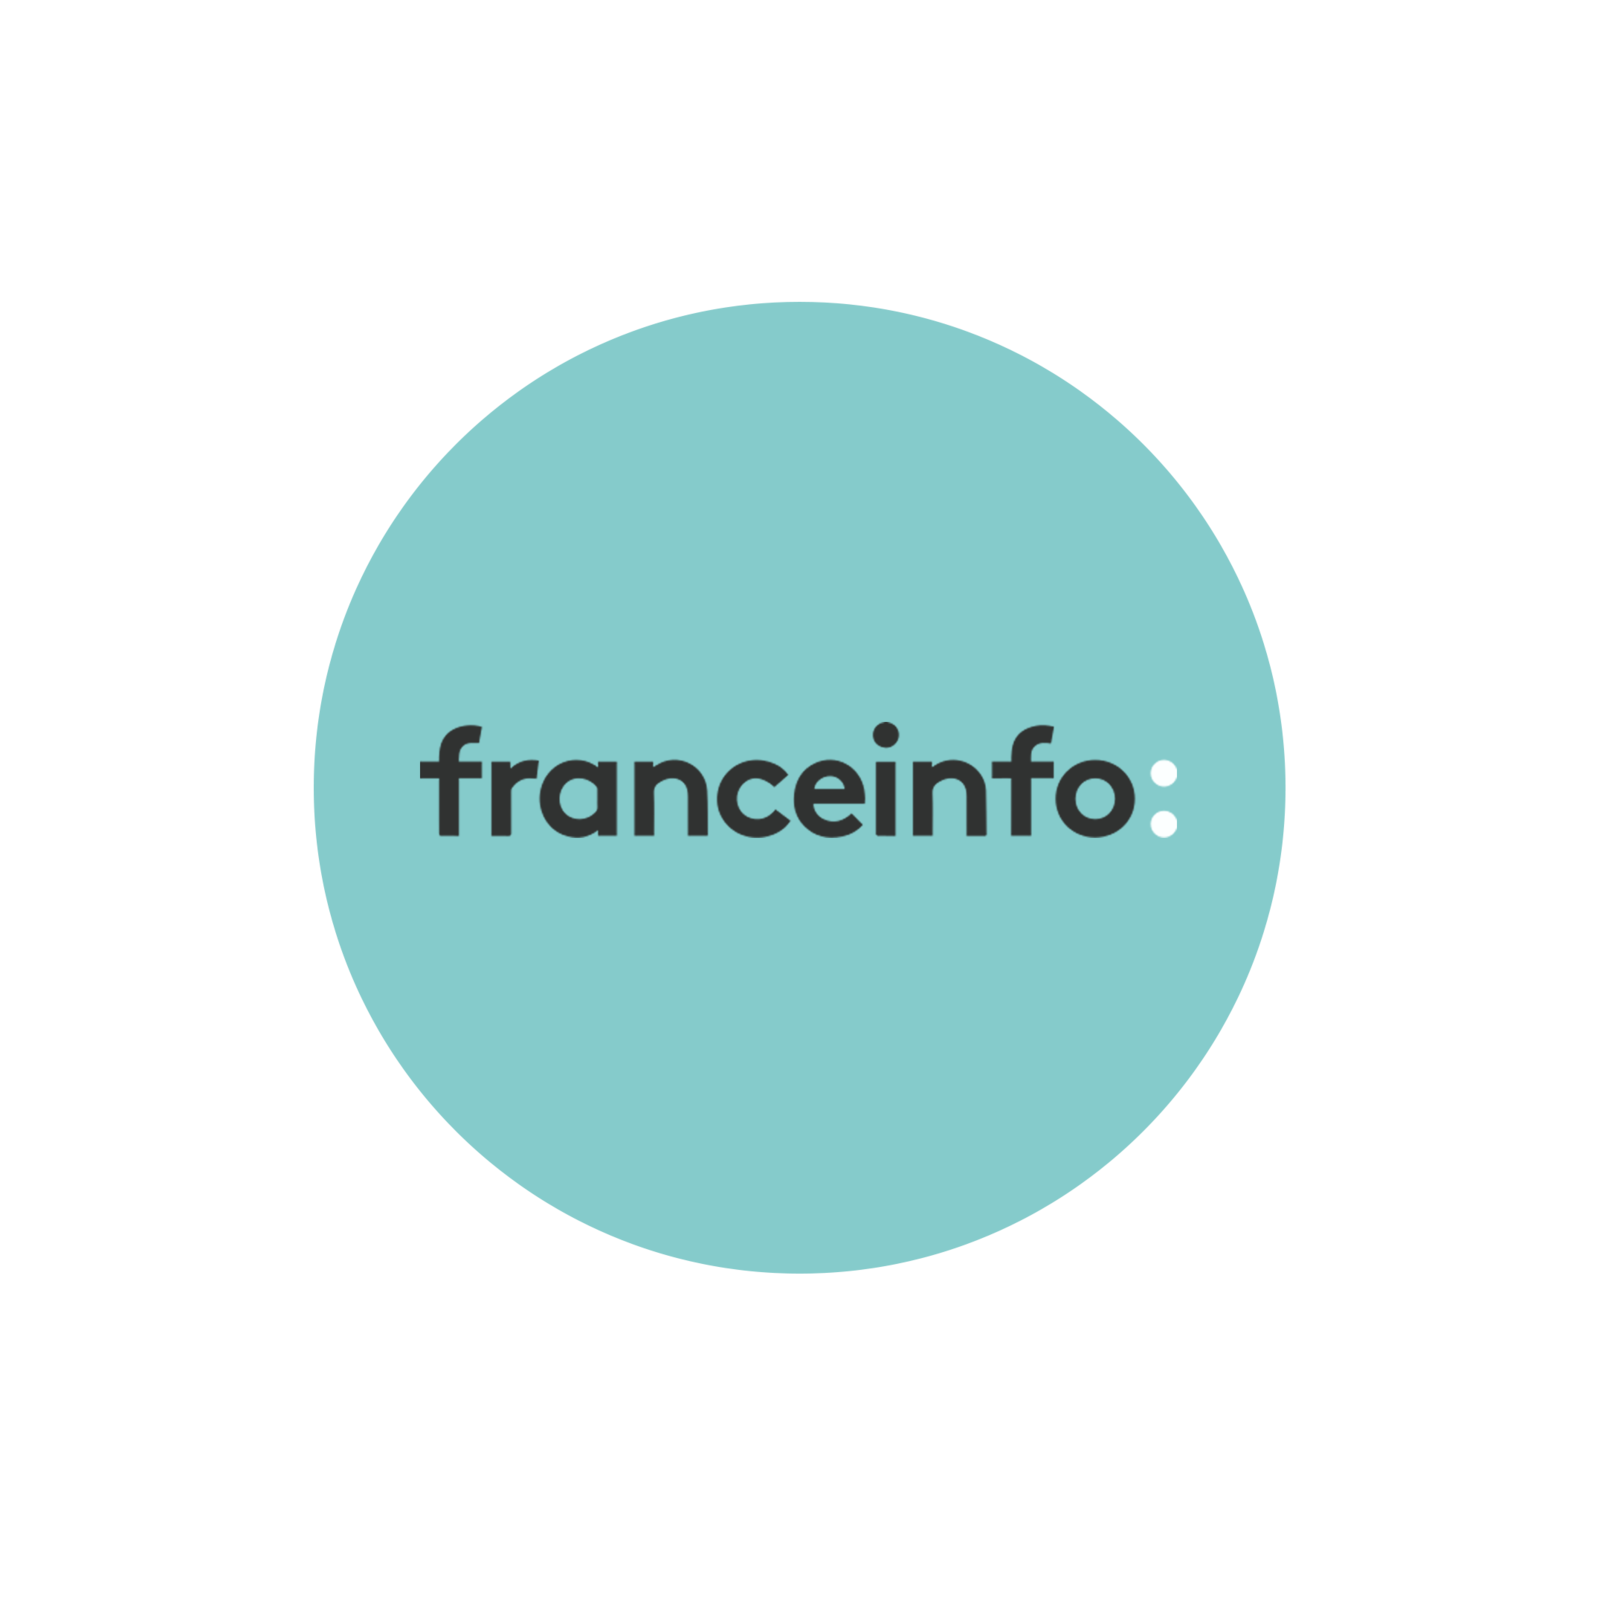 Franceinfo.fr lance la grande opération #MonMaire